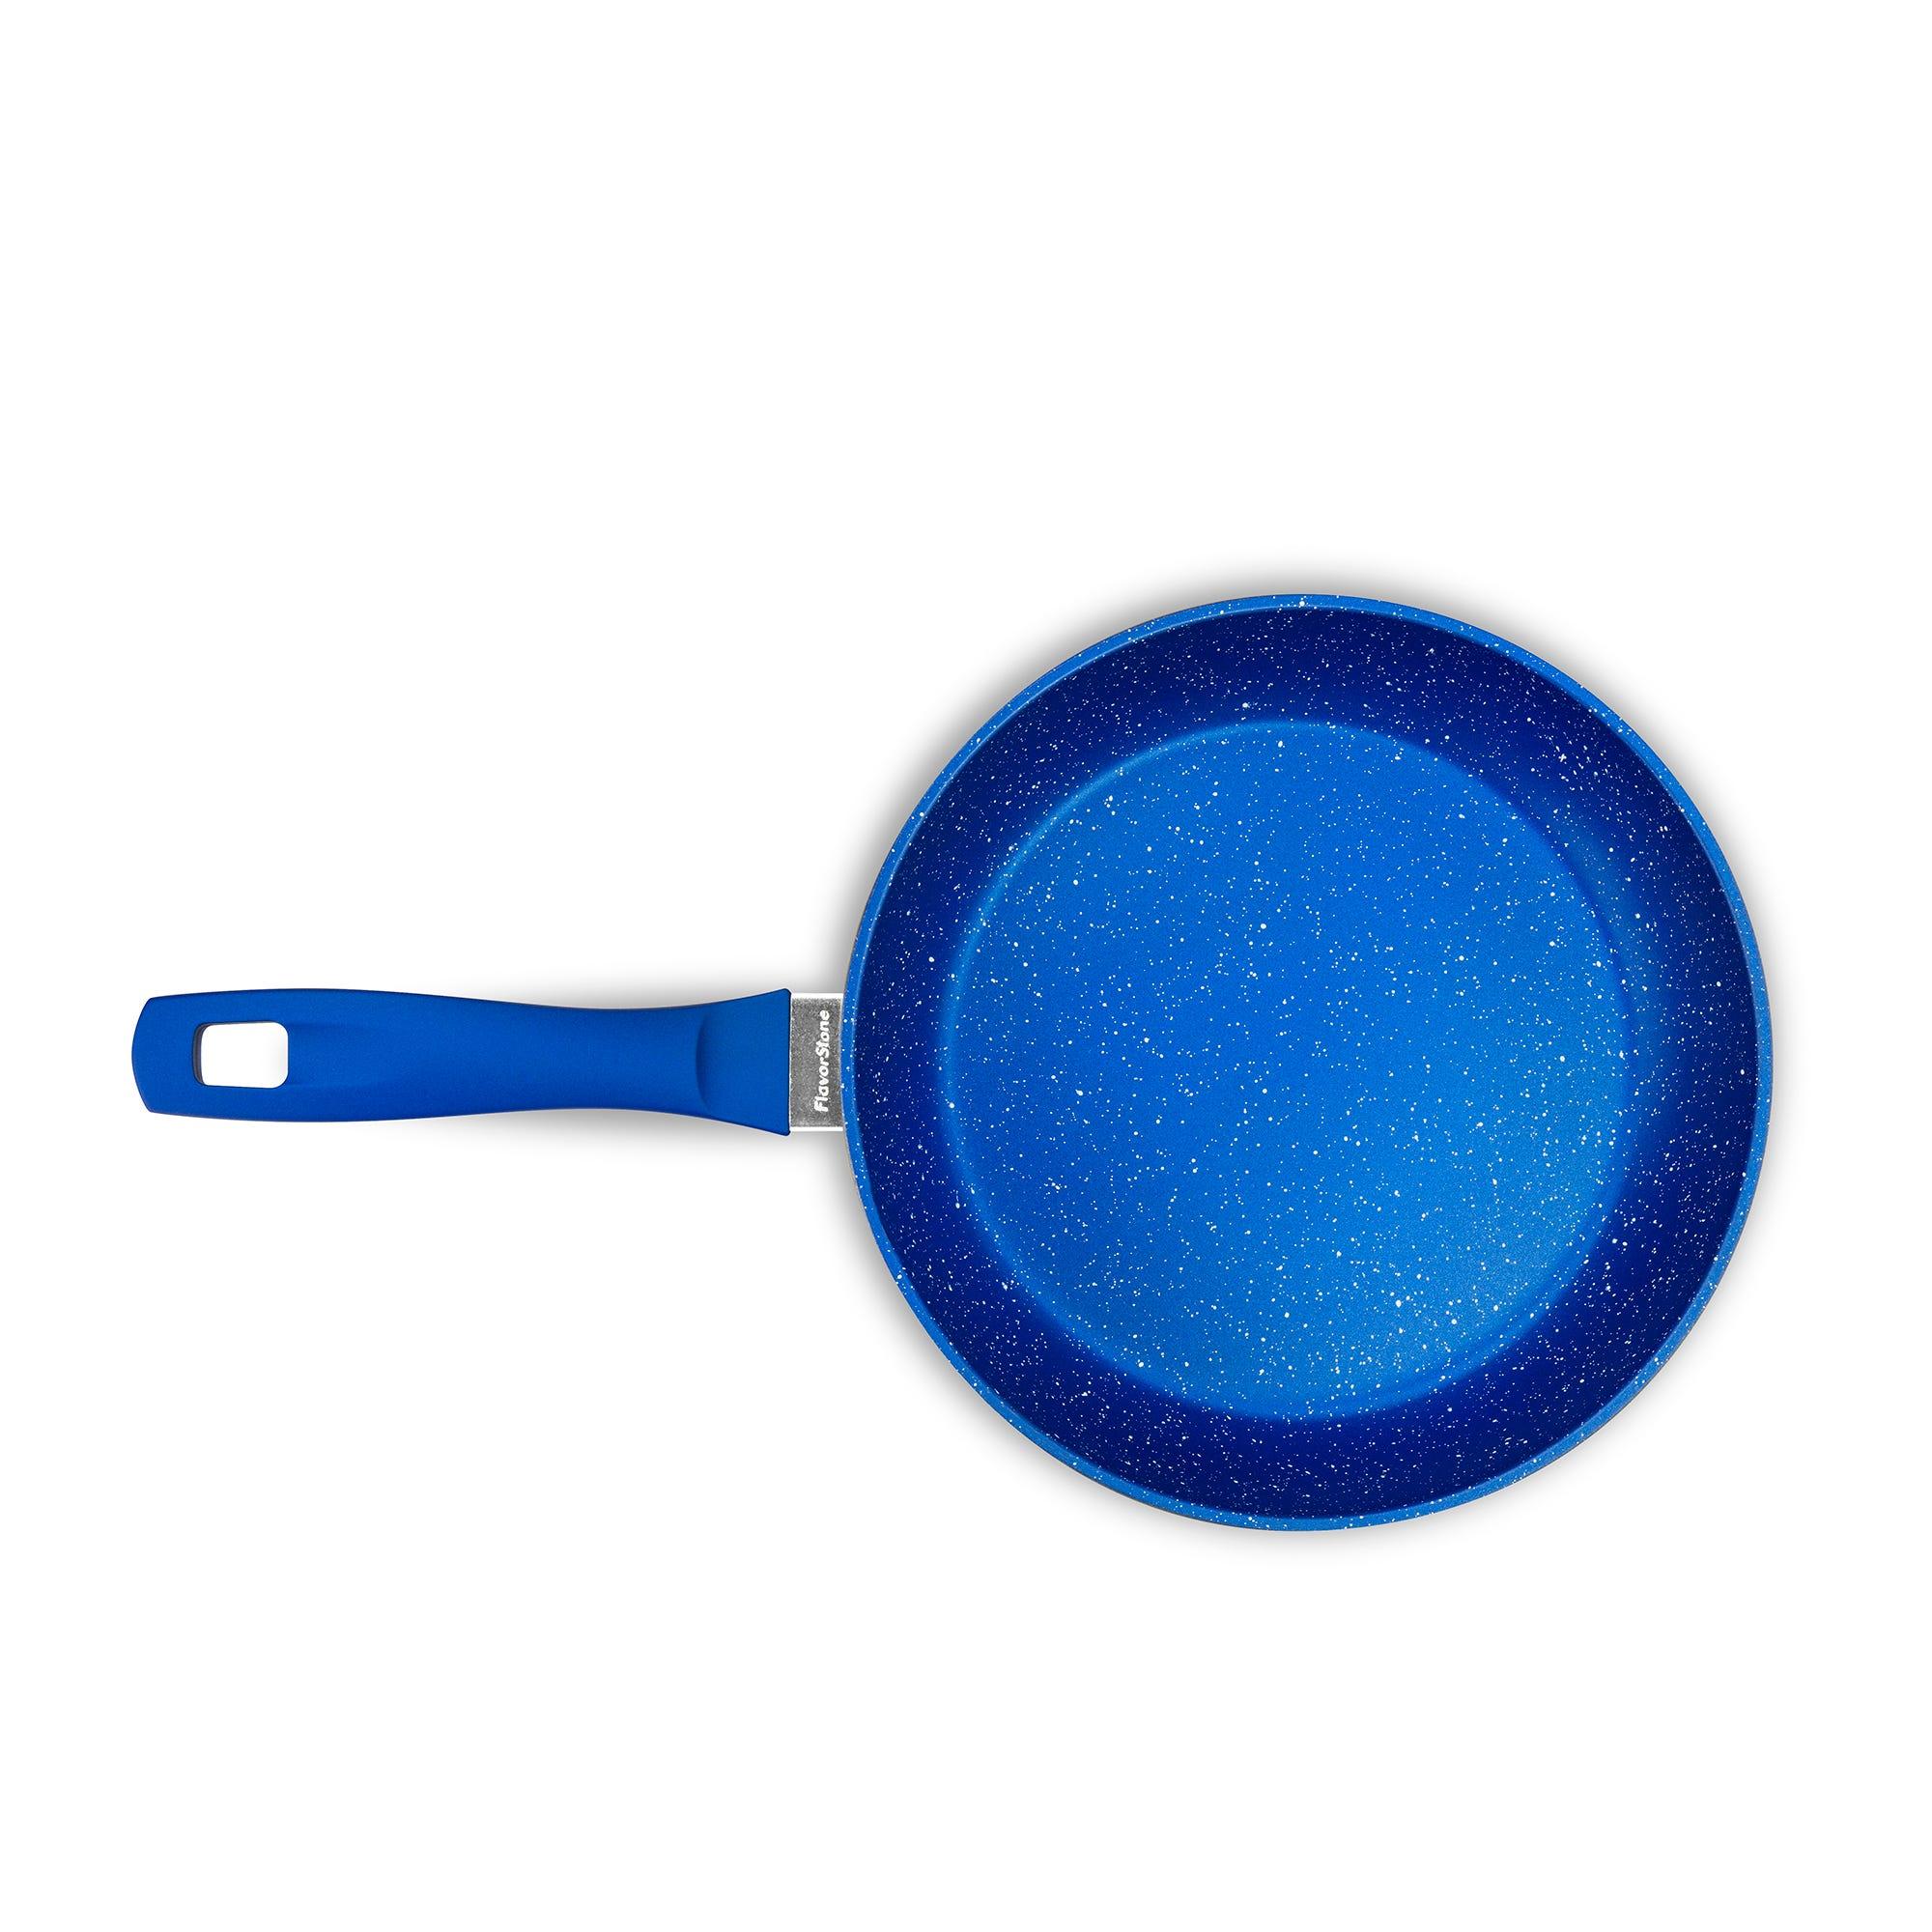 Sartén individual Flavor Stone de 24 cm en azul